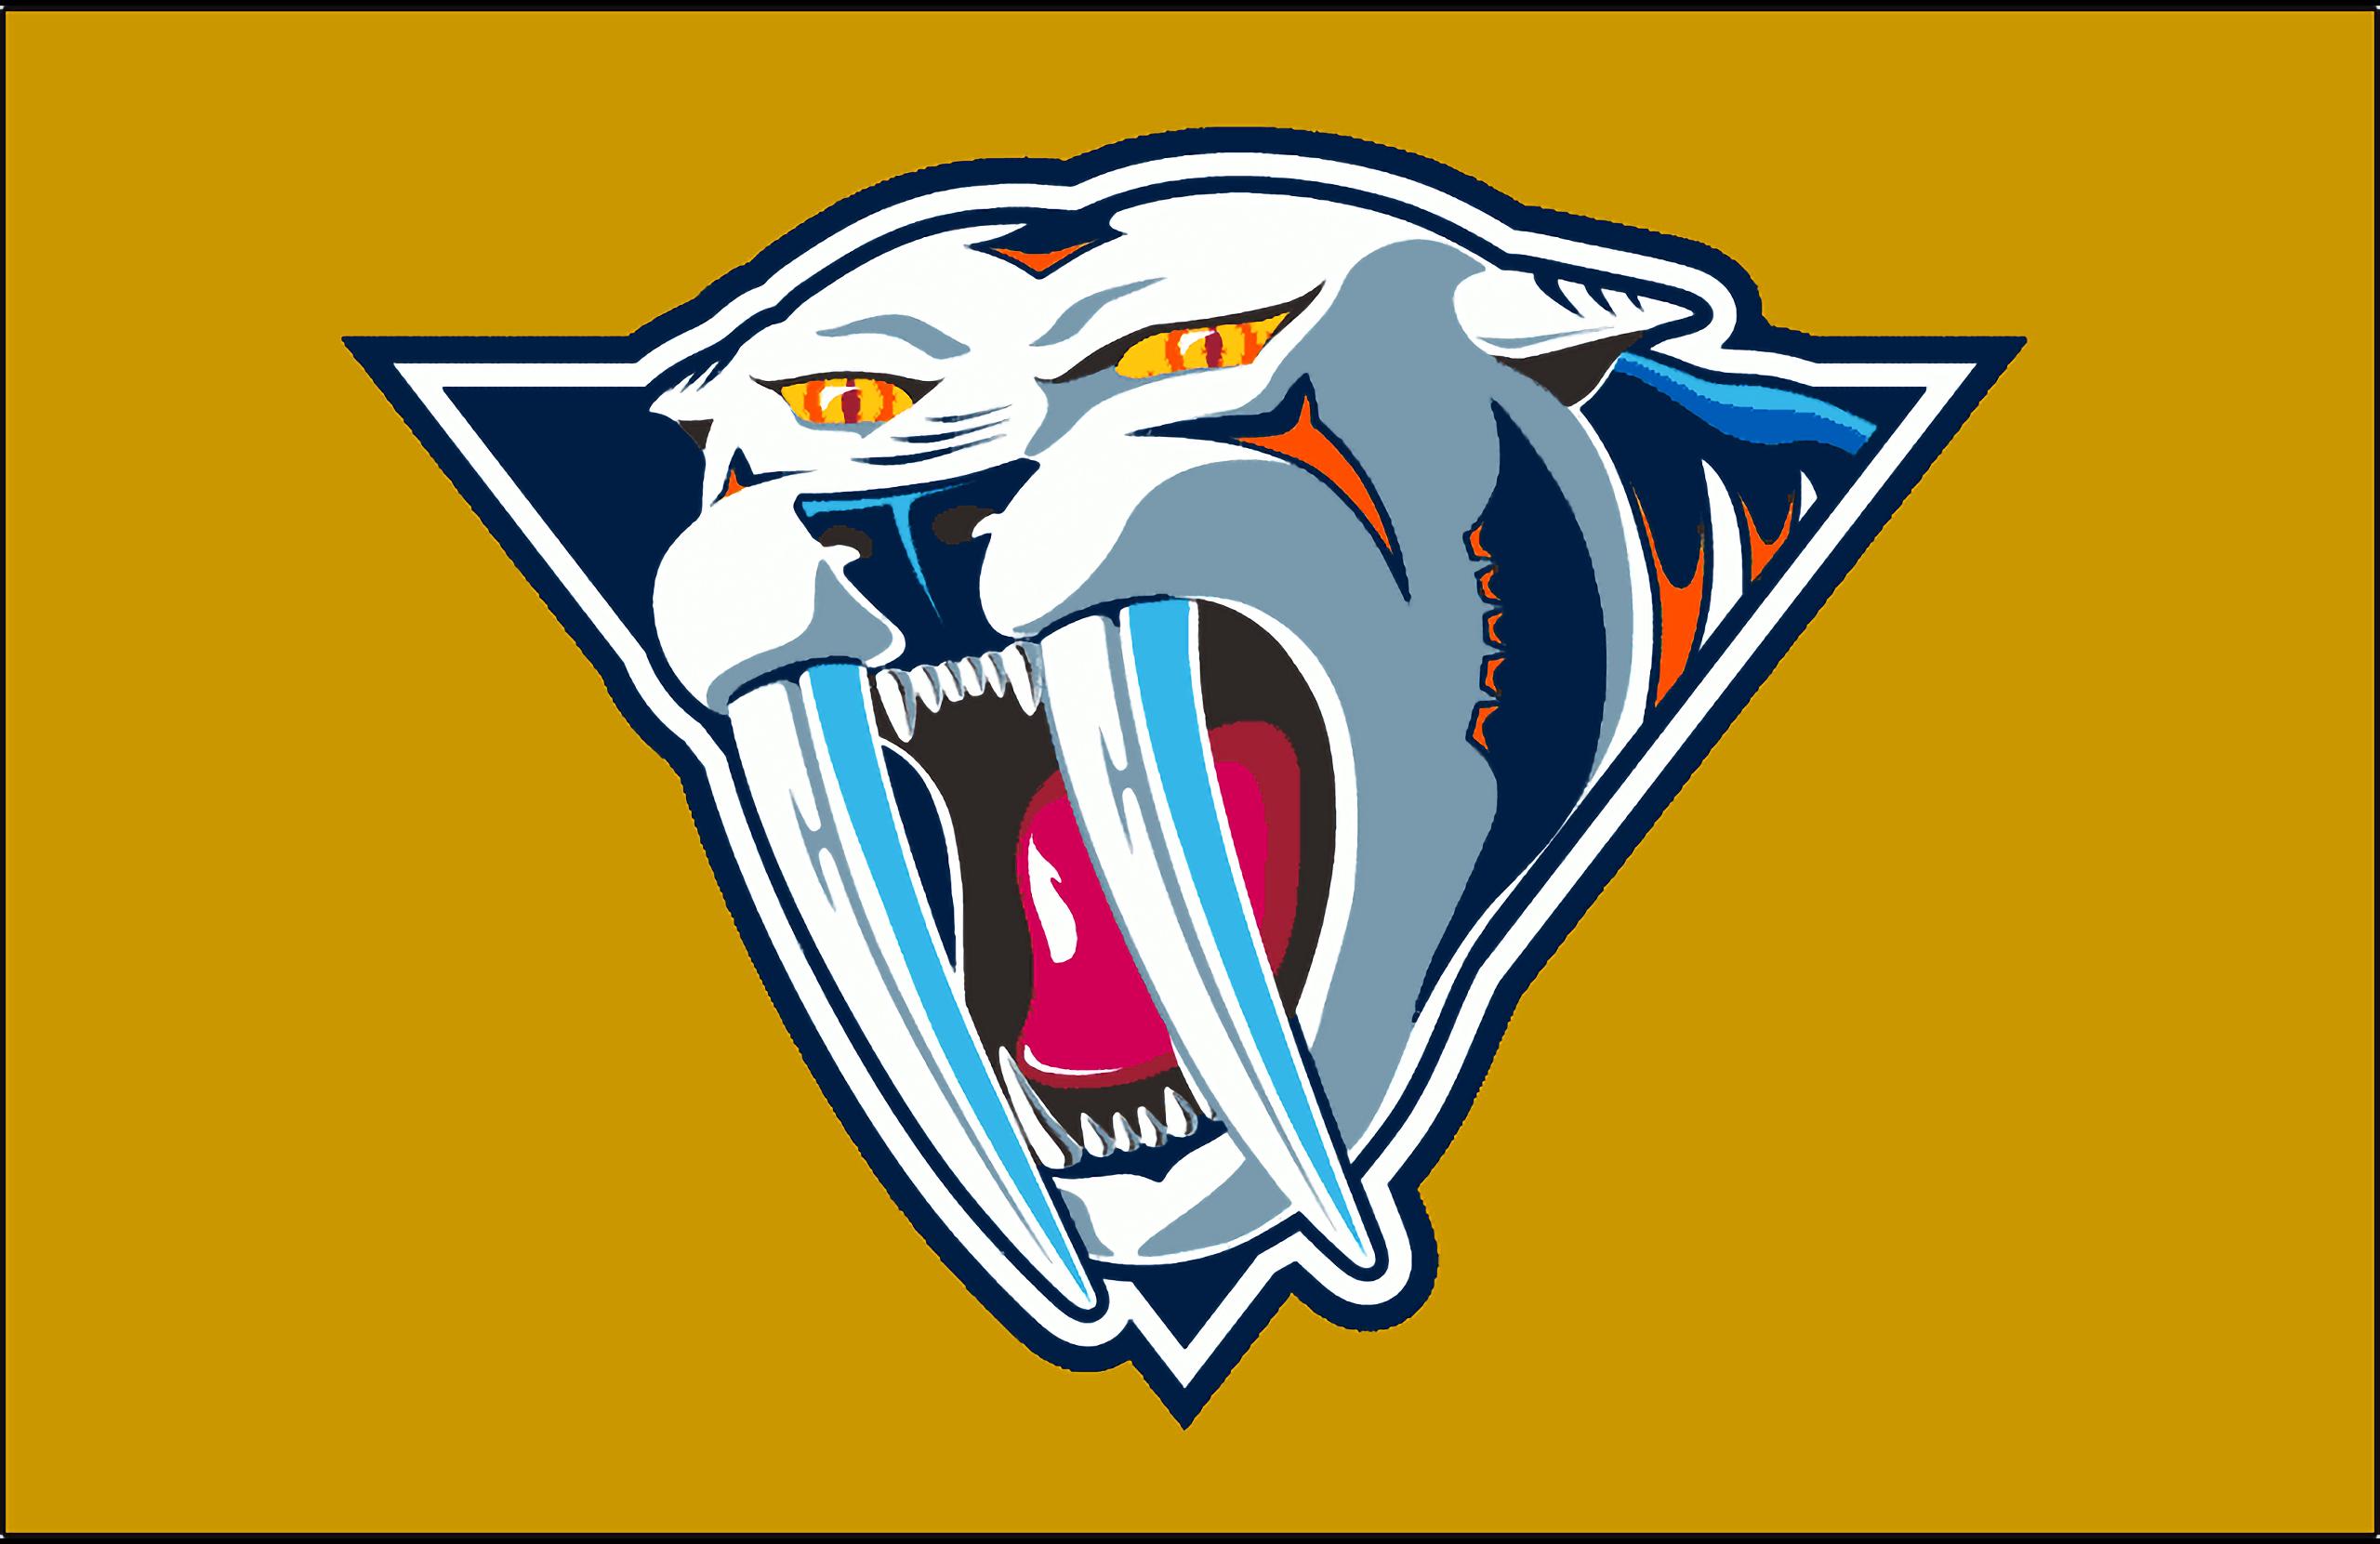 Nashville Predators Wallpapers ID859214